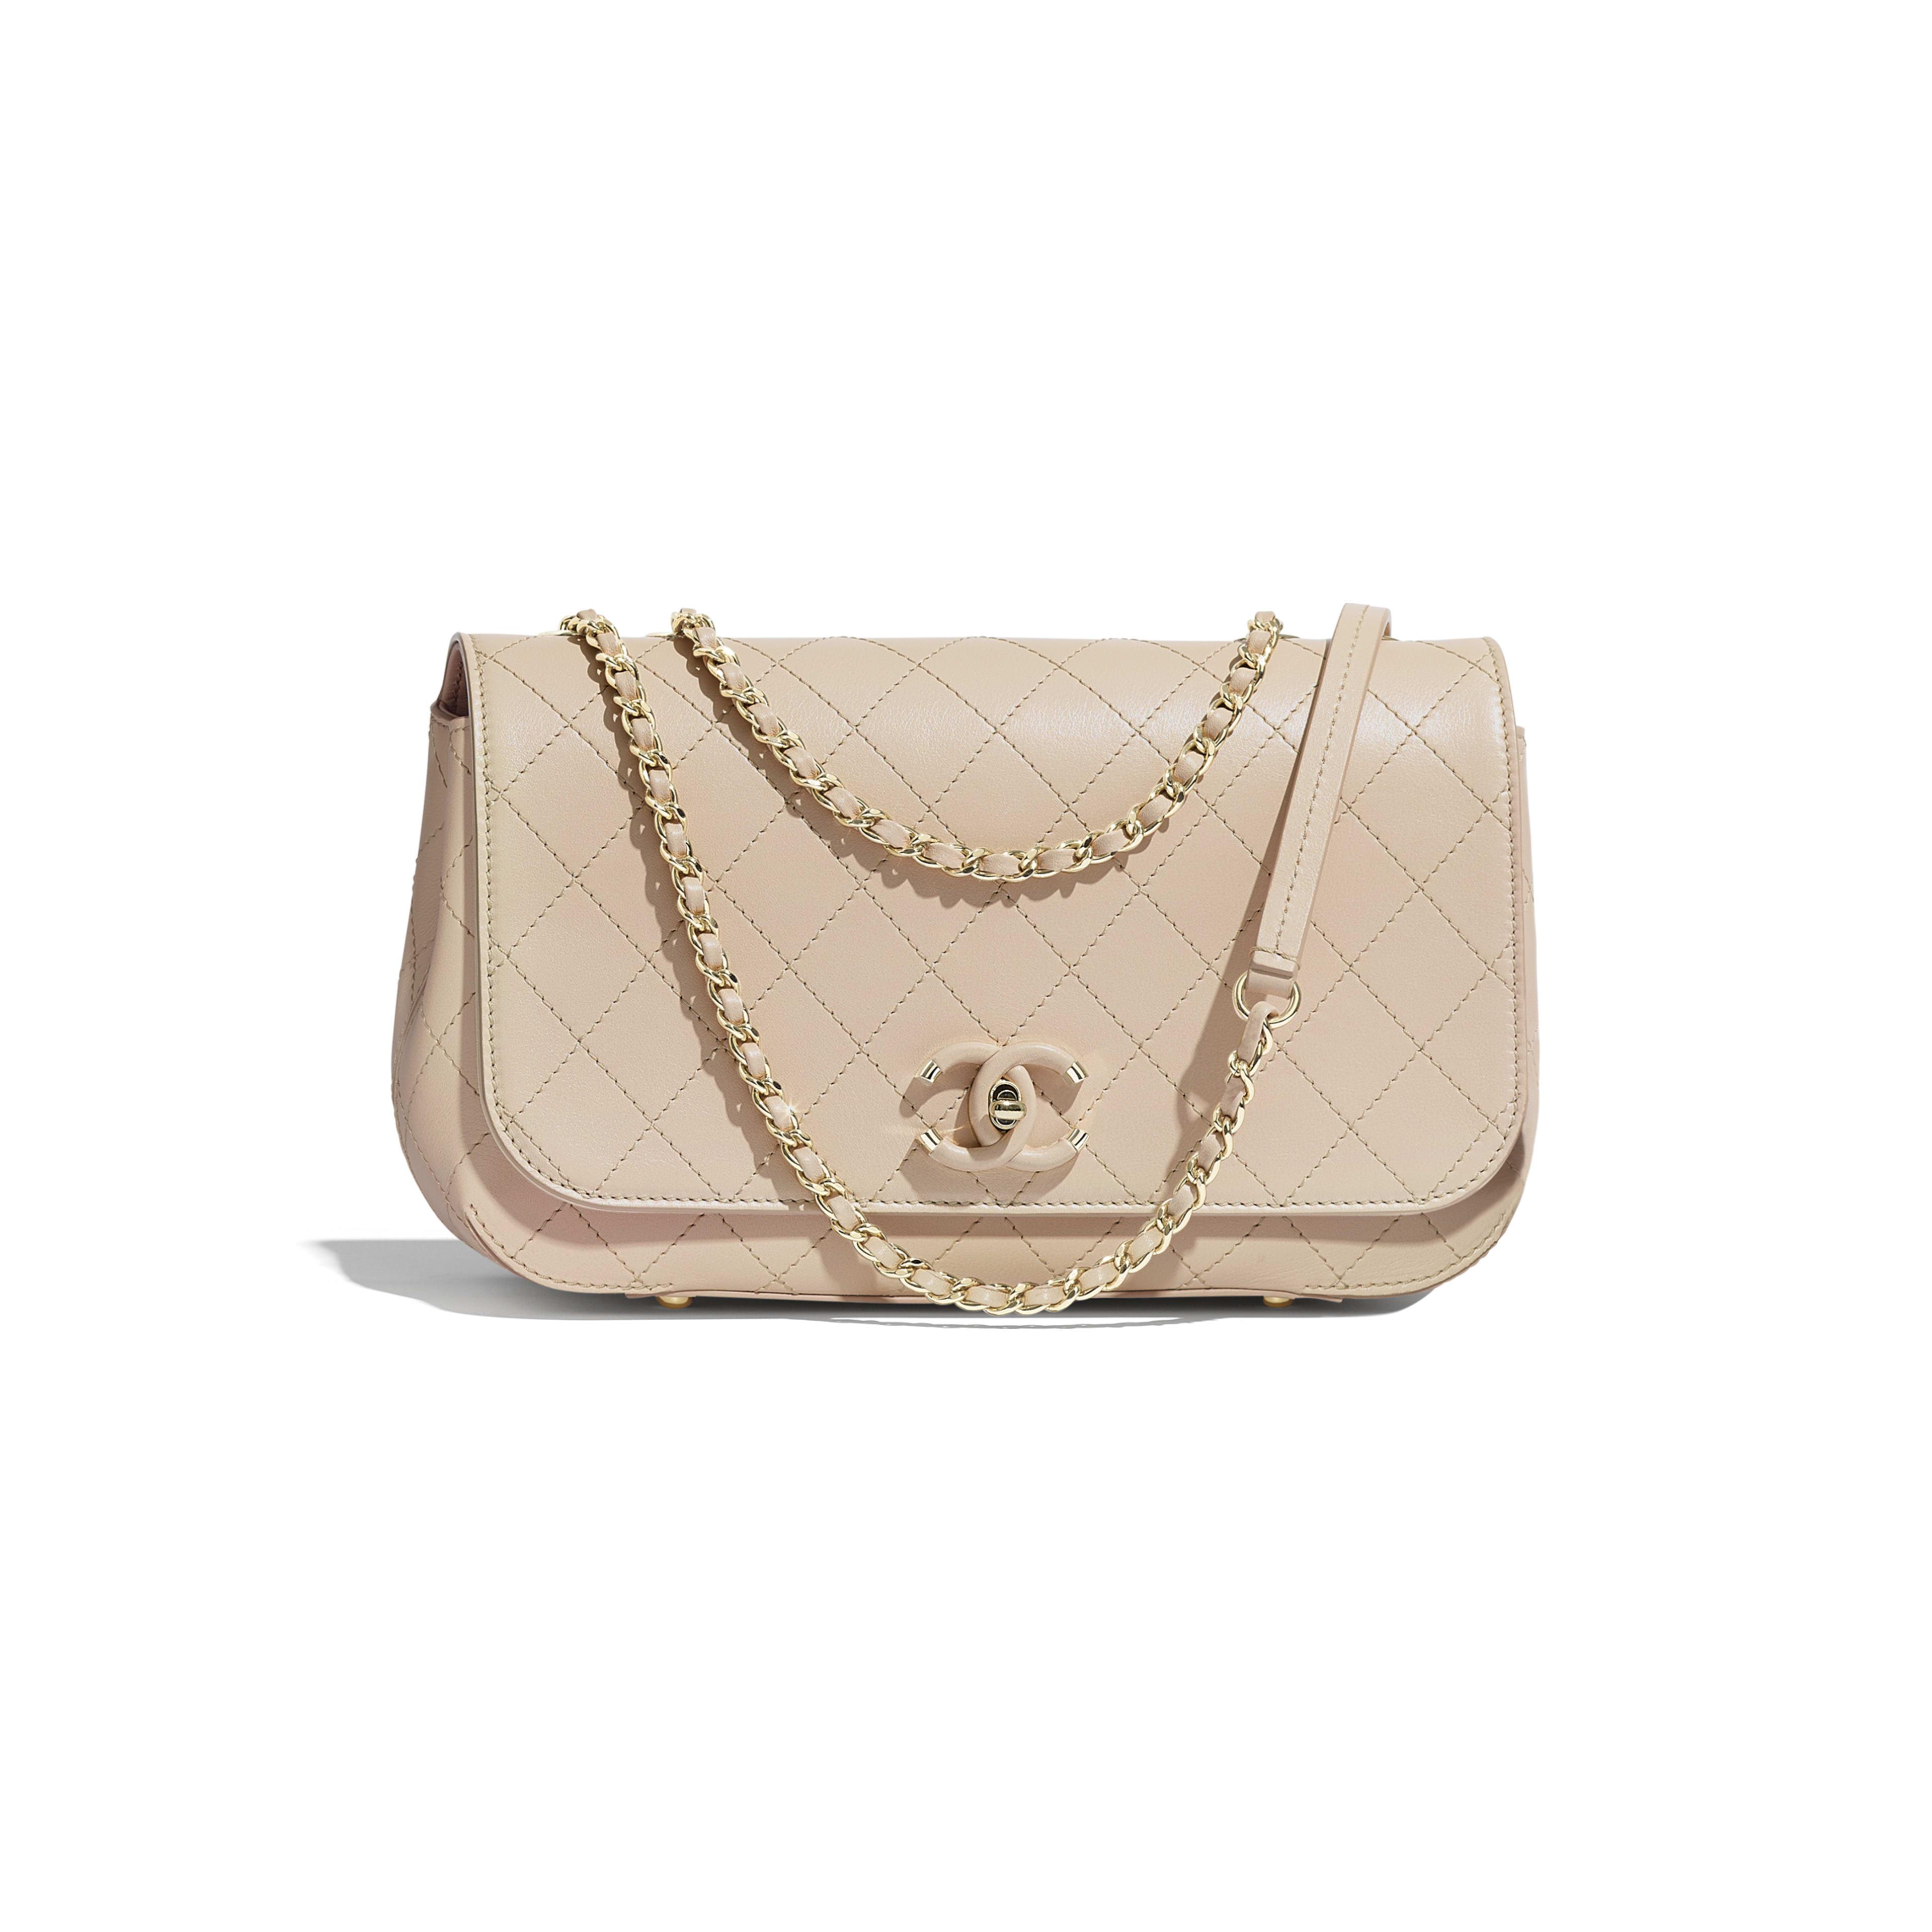 233a2fe6131f Flap Bag - Beige - Calfskin   Gold-Tone Metal - Default view - see ...